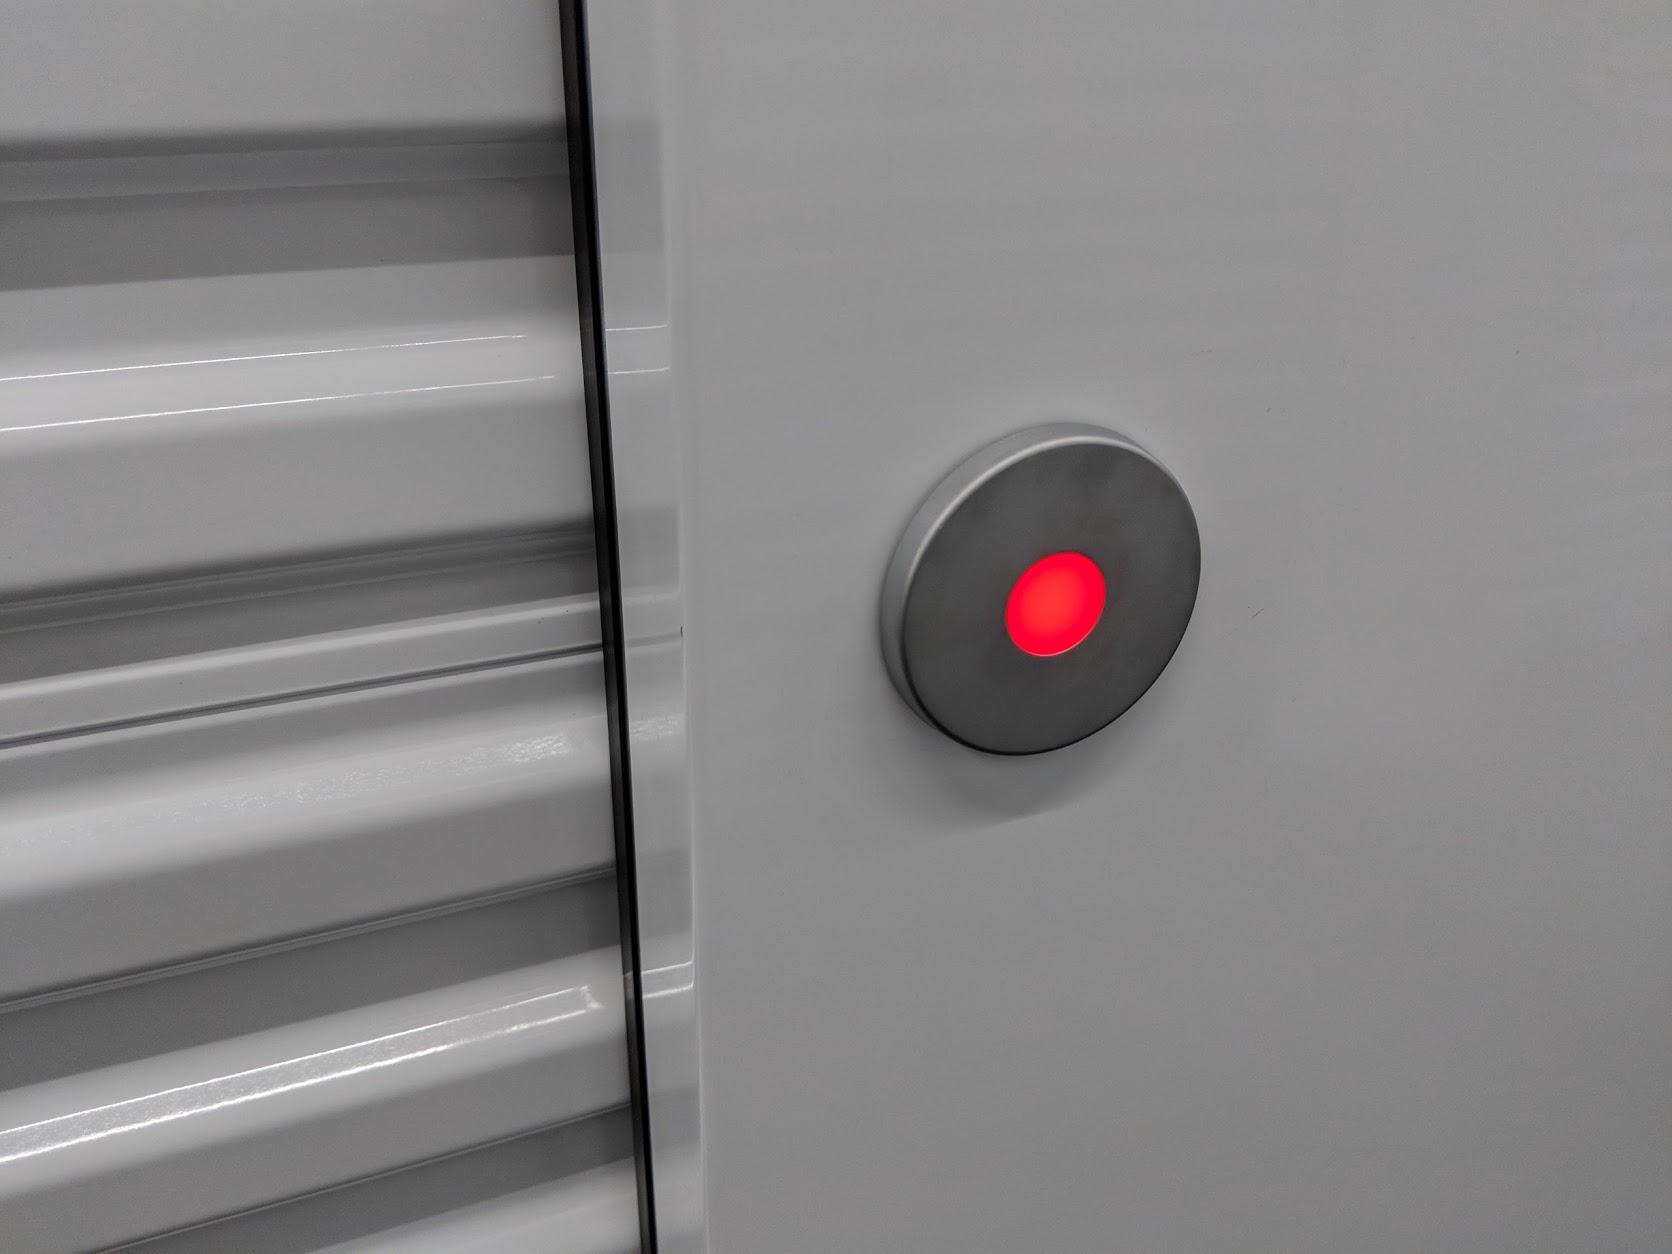 SecurGuard Smart Entry System Bluetooth lock